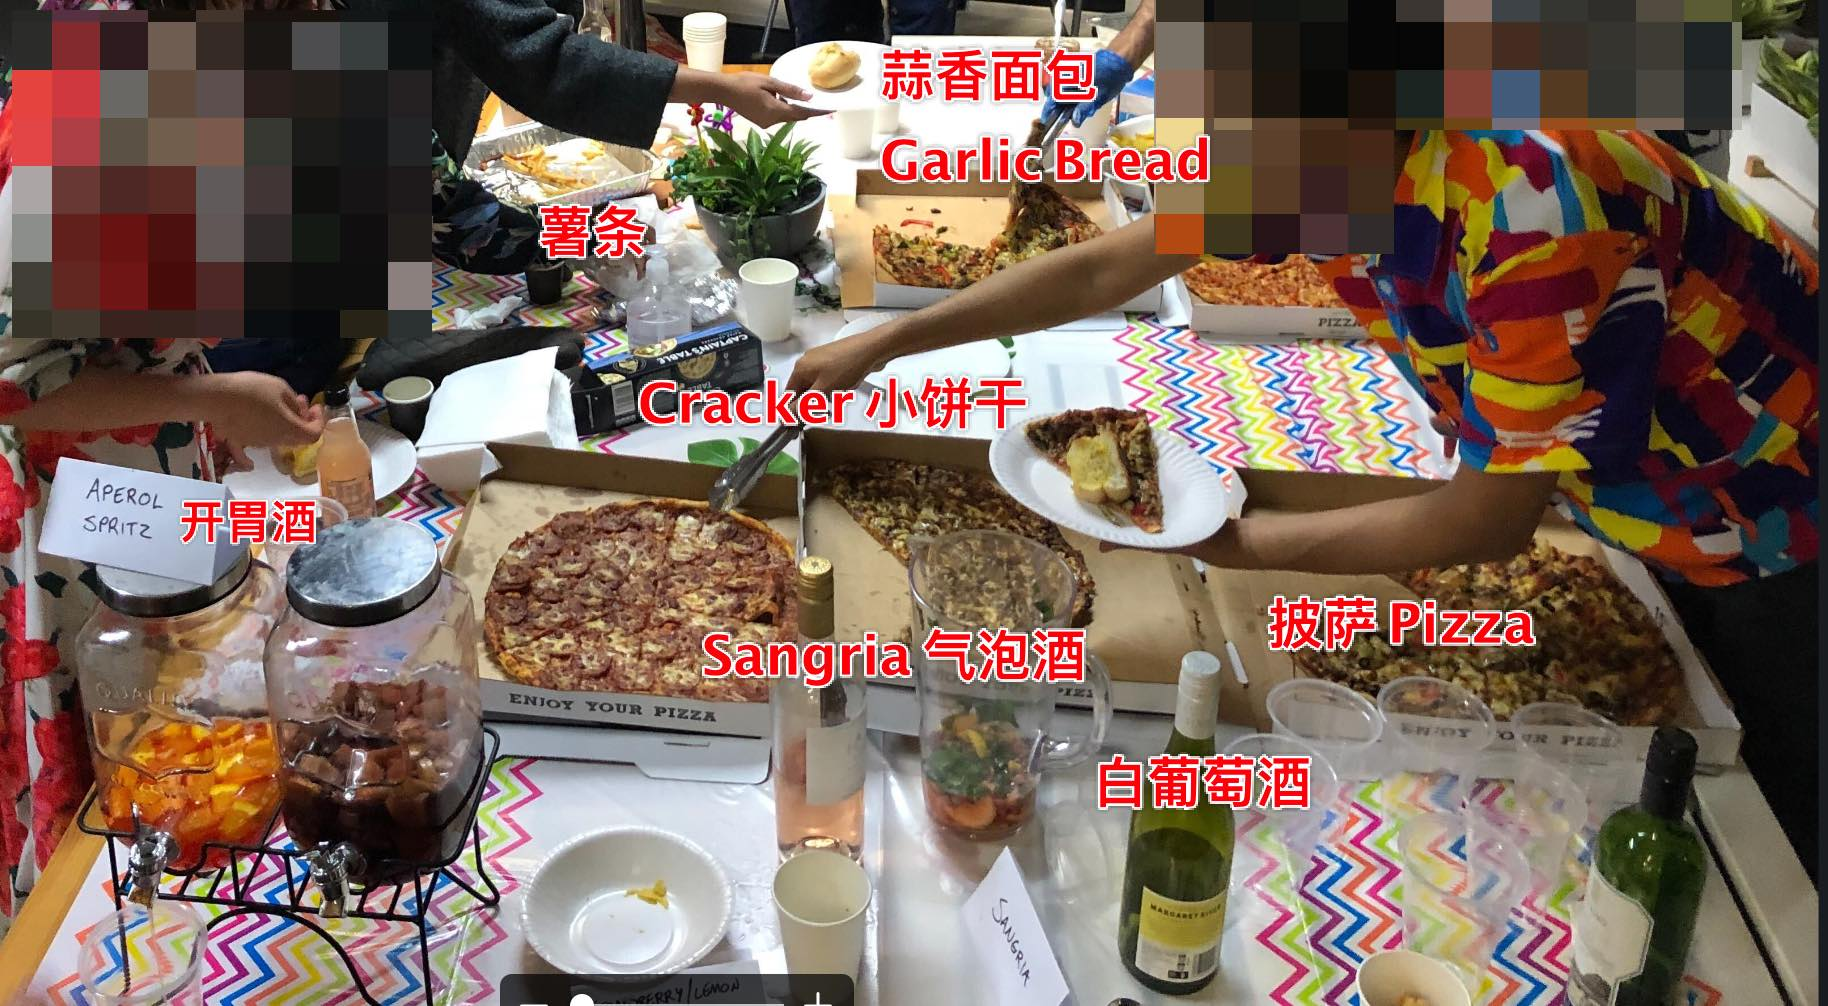 Party 酒水食物